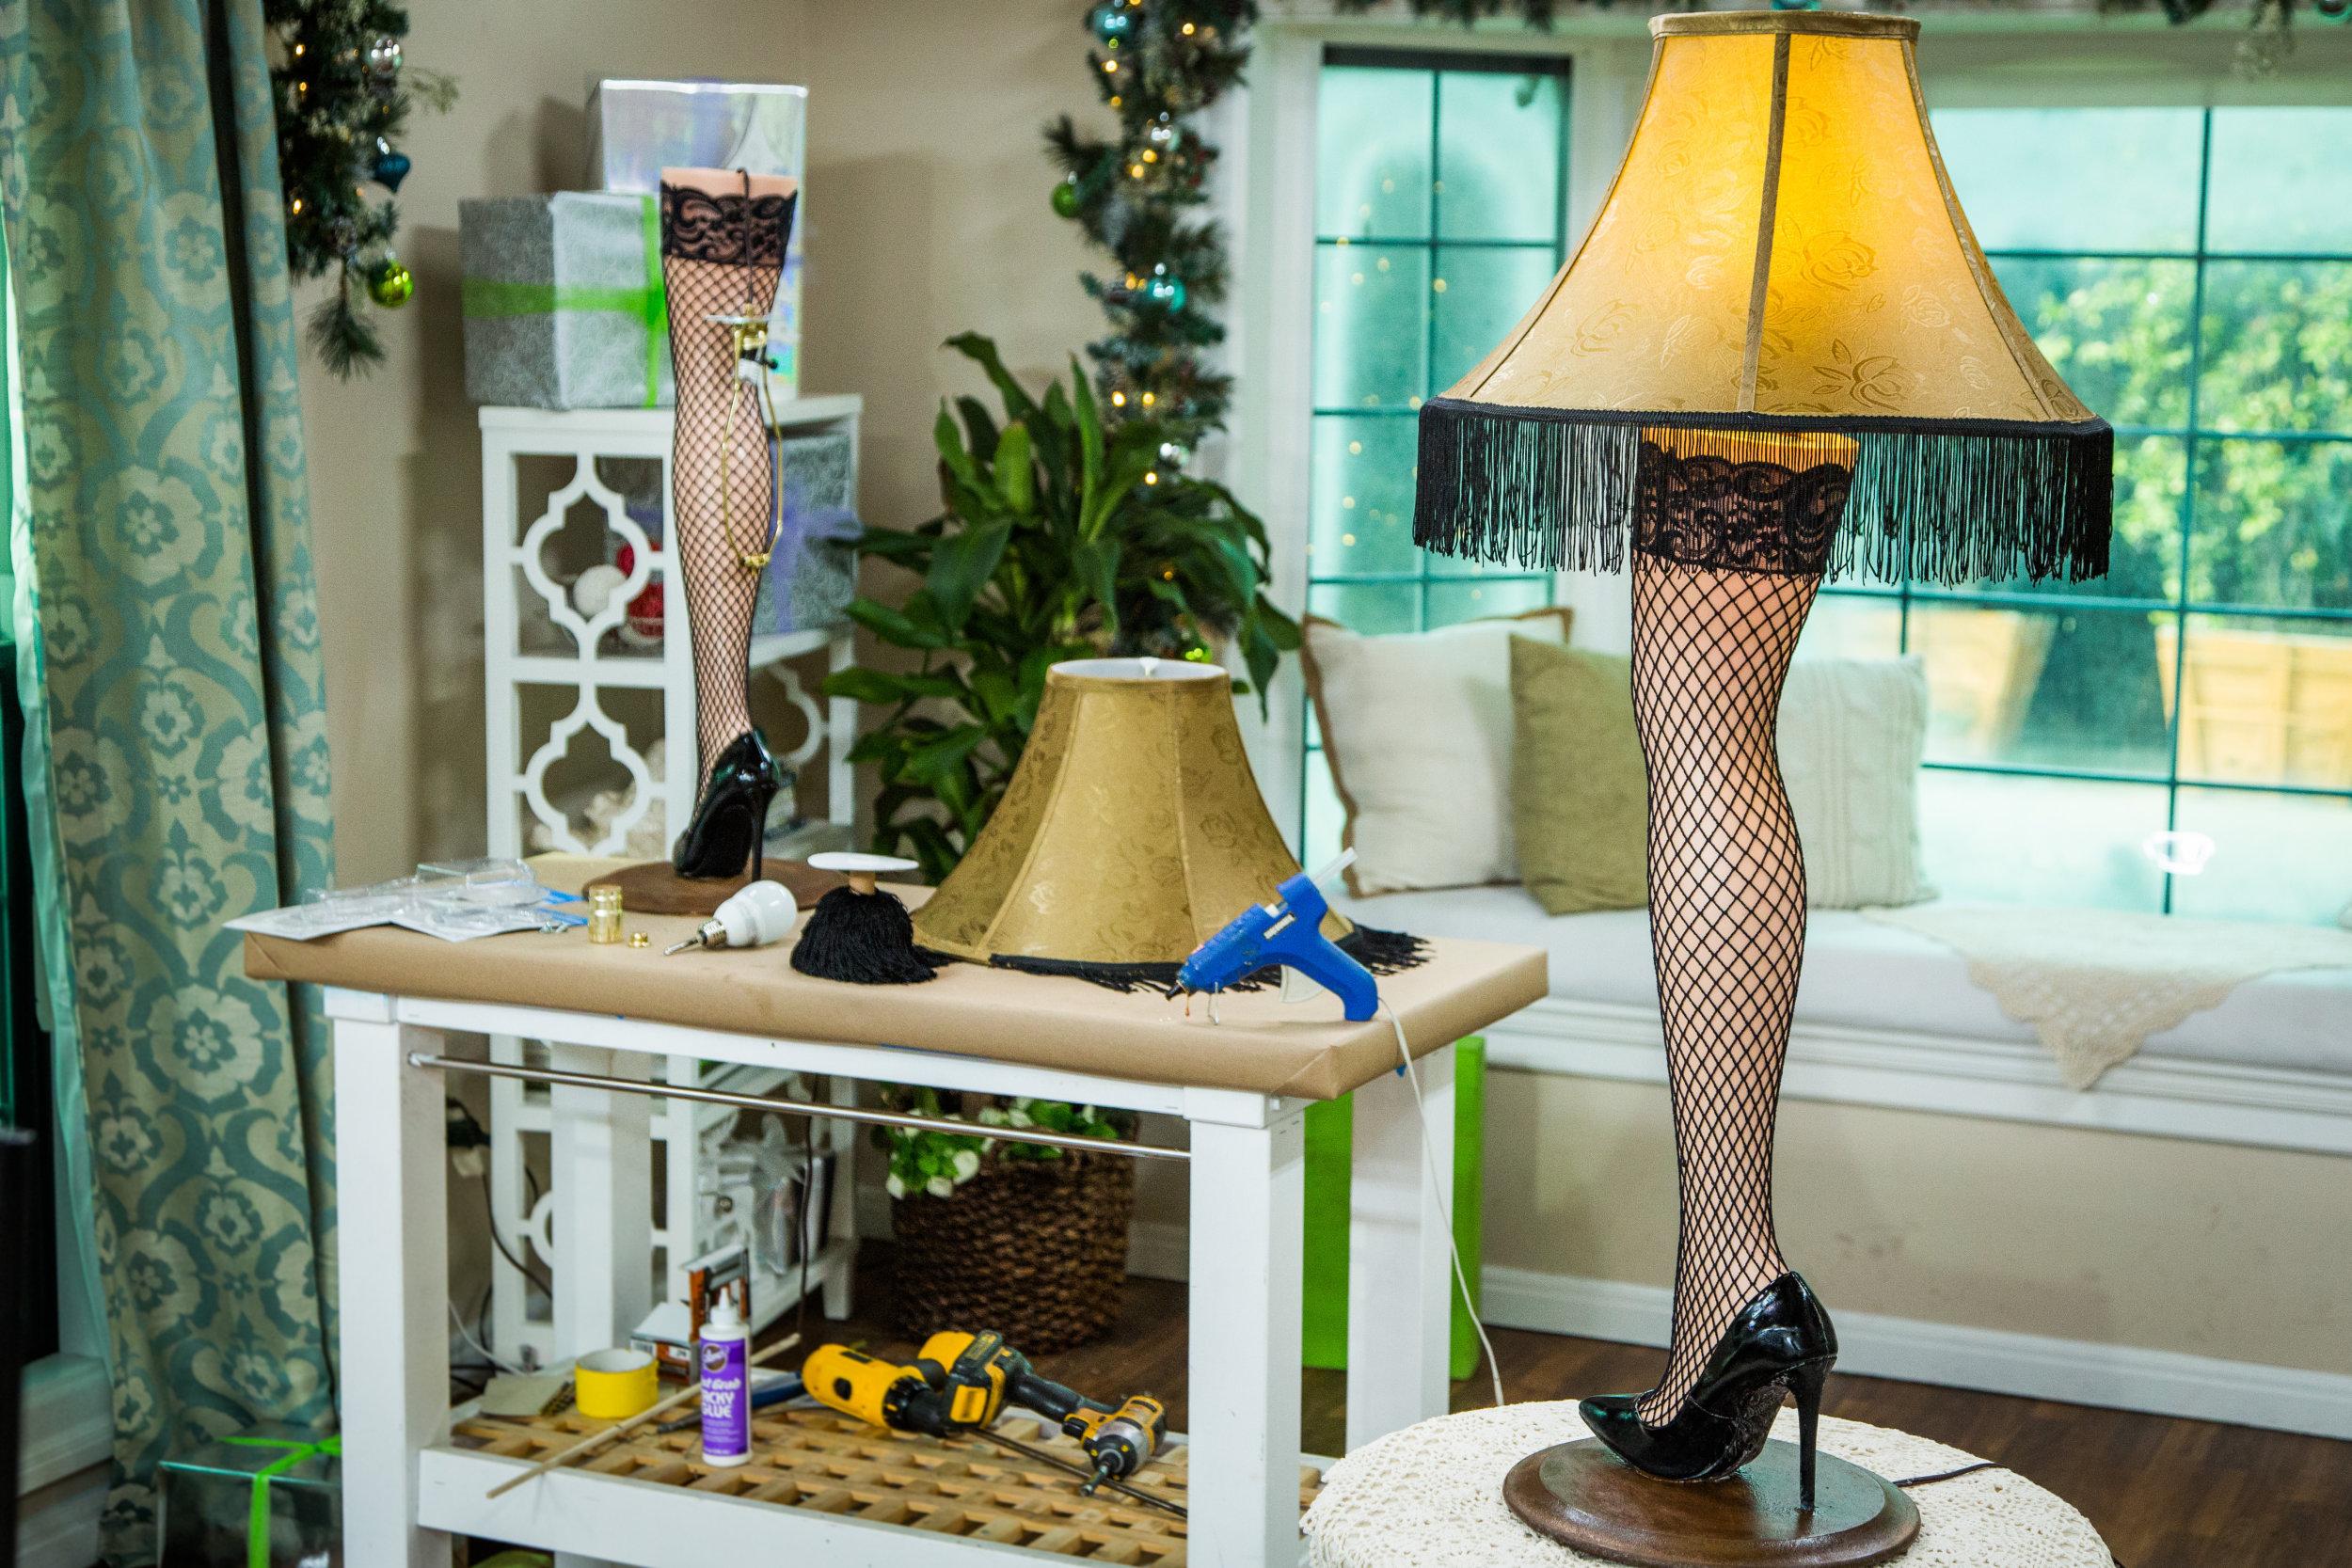 How To Diy Leg Lamp Home Amp Family Hallmark Channel